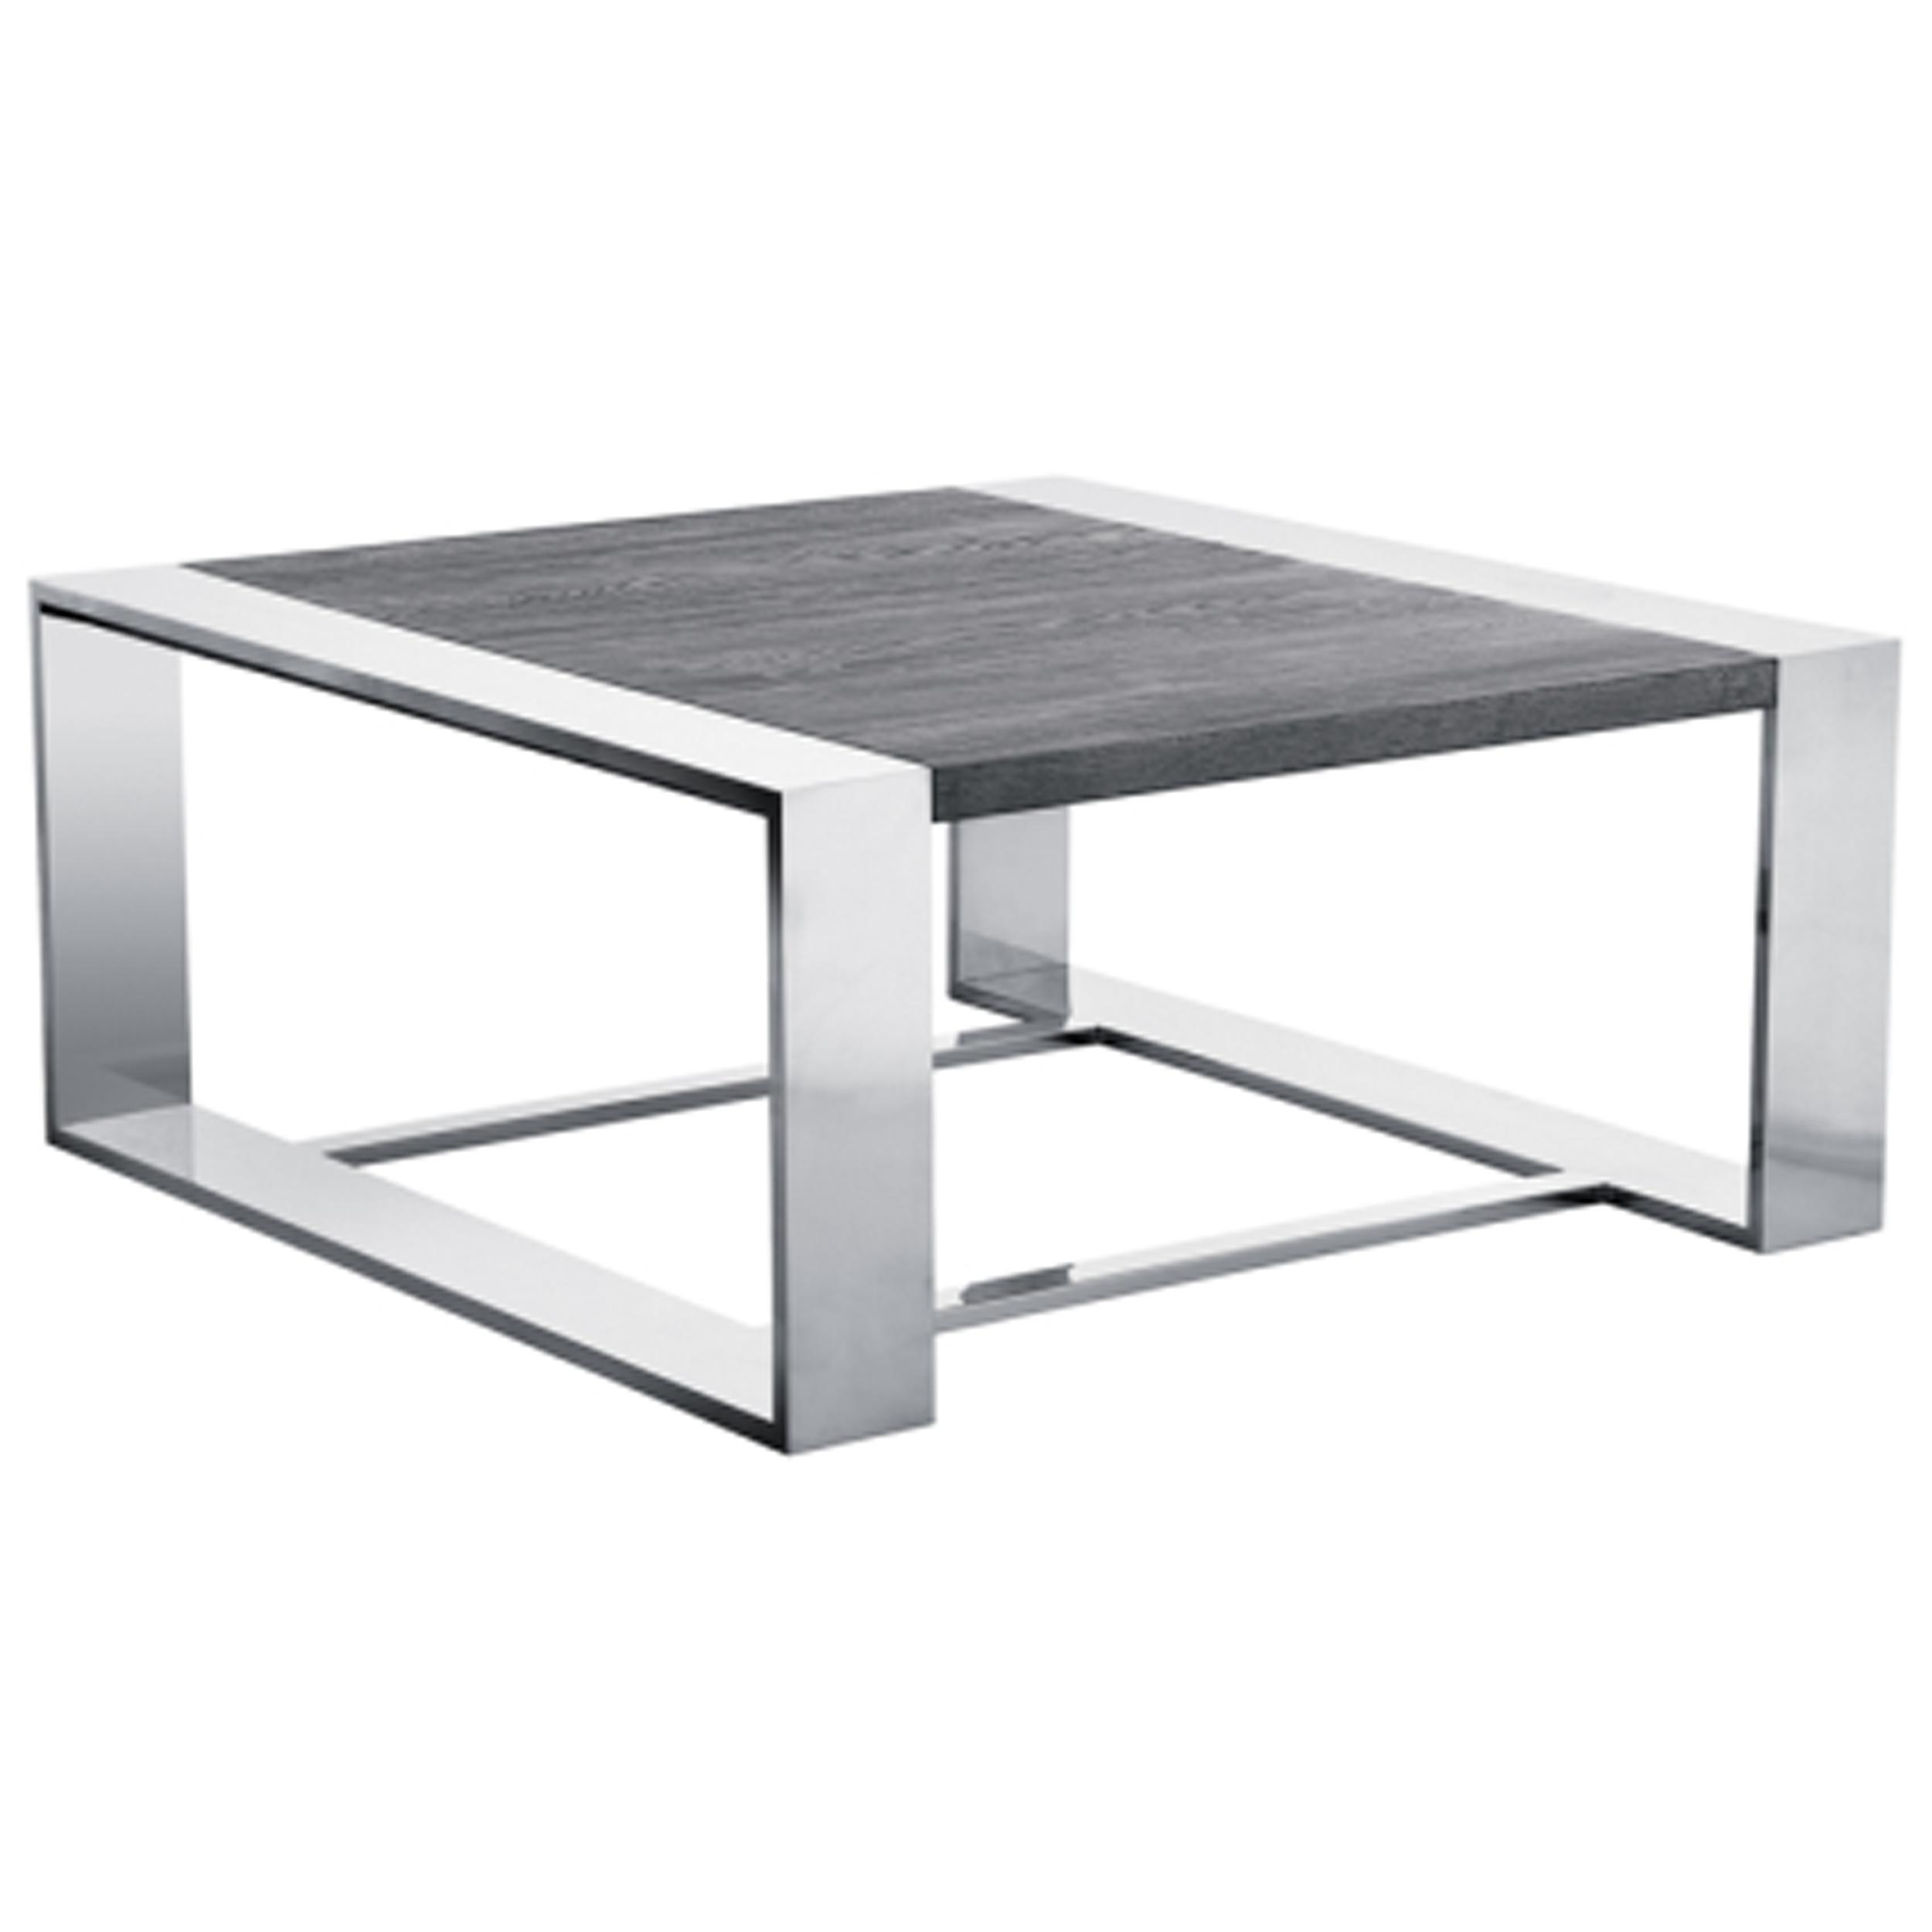 Dalton Coffee Table Grey Oak Sleek Coffee Table Display Coffee Table Modern Coffee Tables